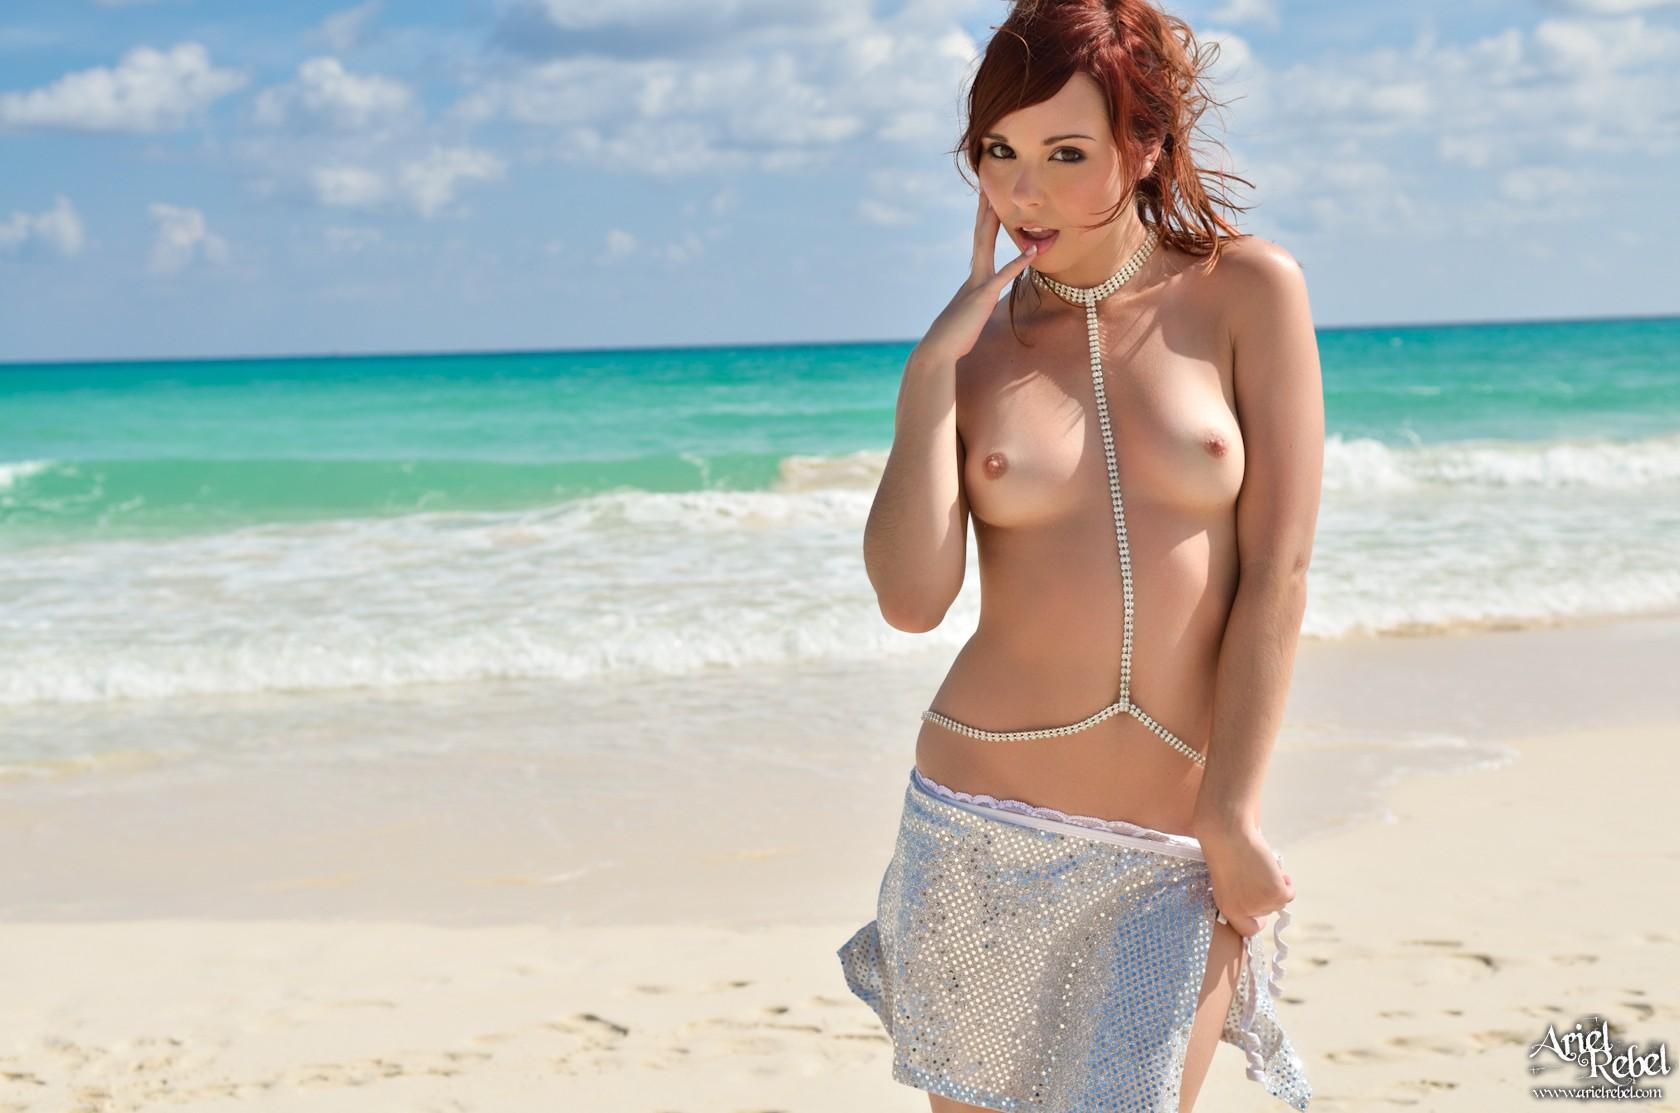 Ariel rebel naked beach